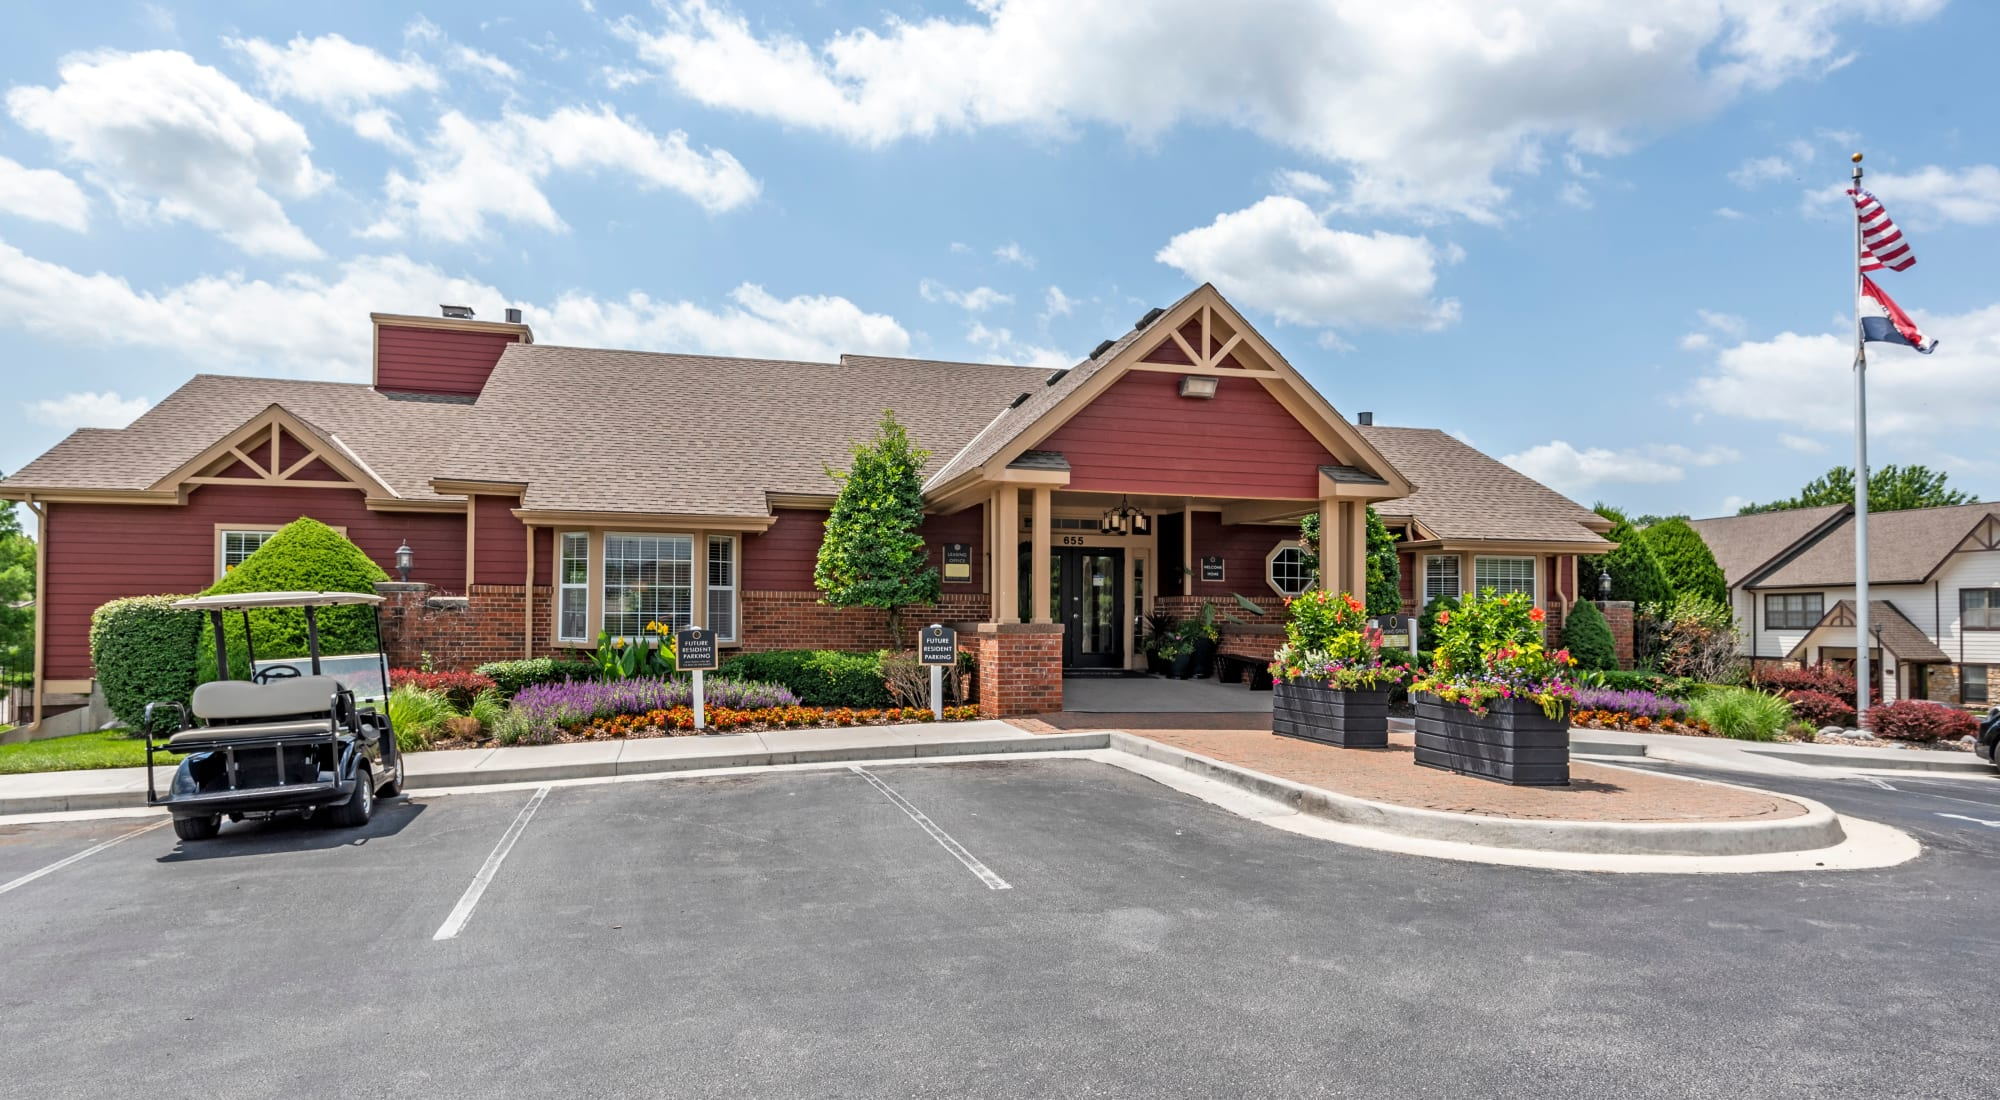 Contact us at Coach House Apartments in Kansas City, Missouri